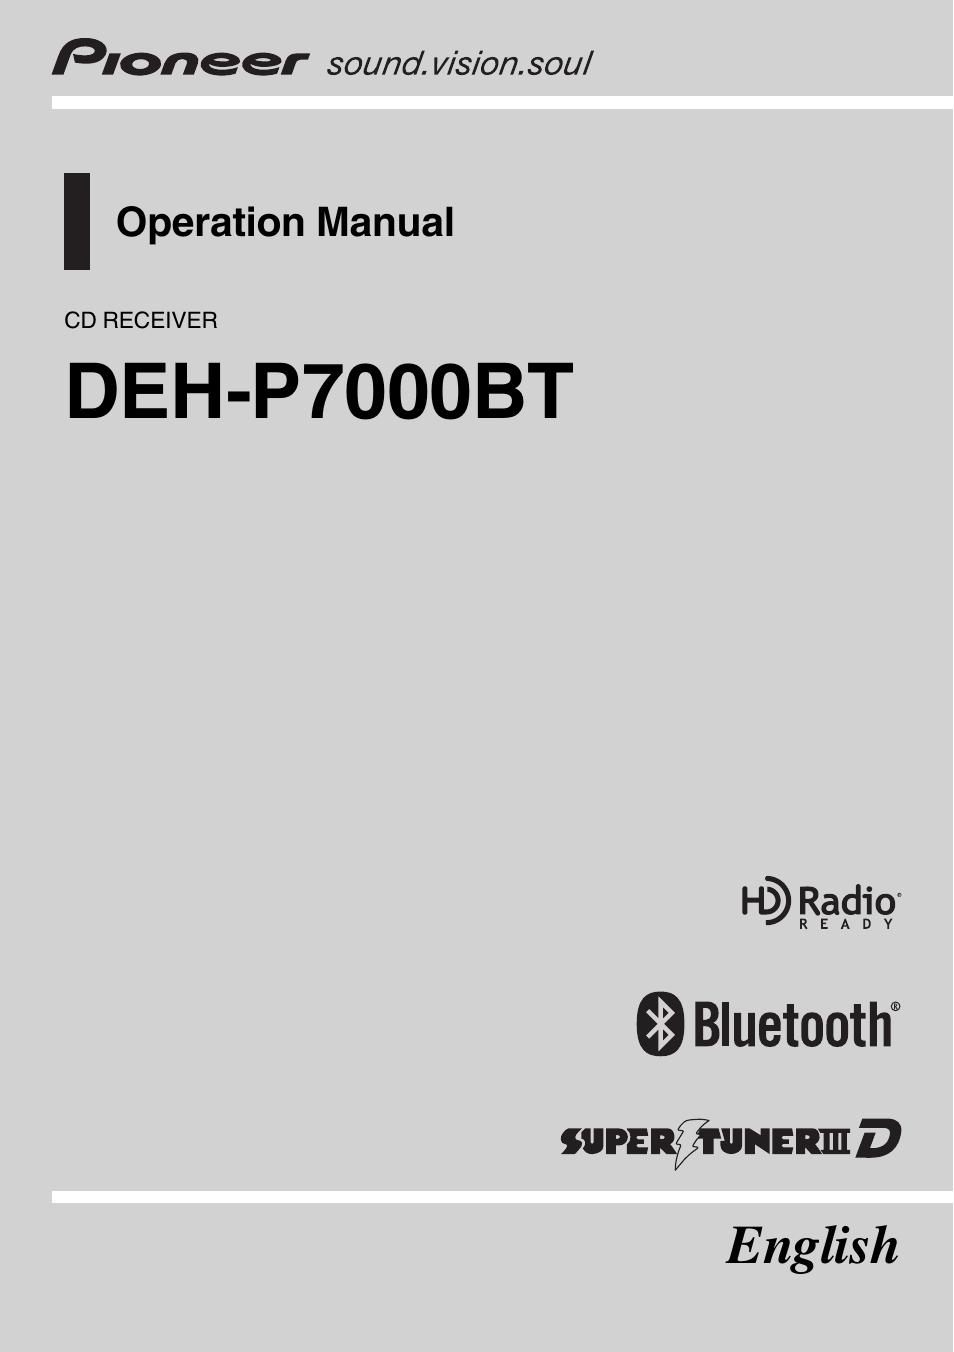 pioneer deh p7000bt user manual 77 pages rh manualsdir com pioneer radio deh-p7000bt manual pioneer deh-p7000bt manual español